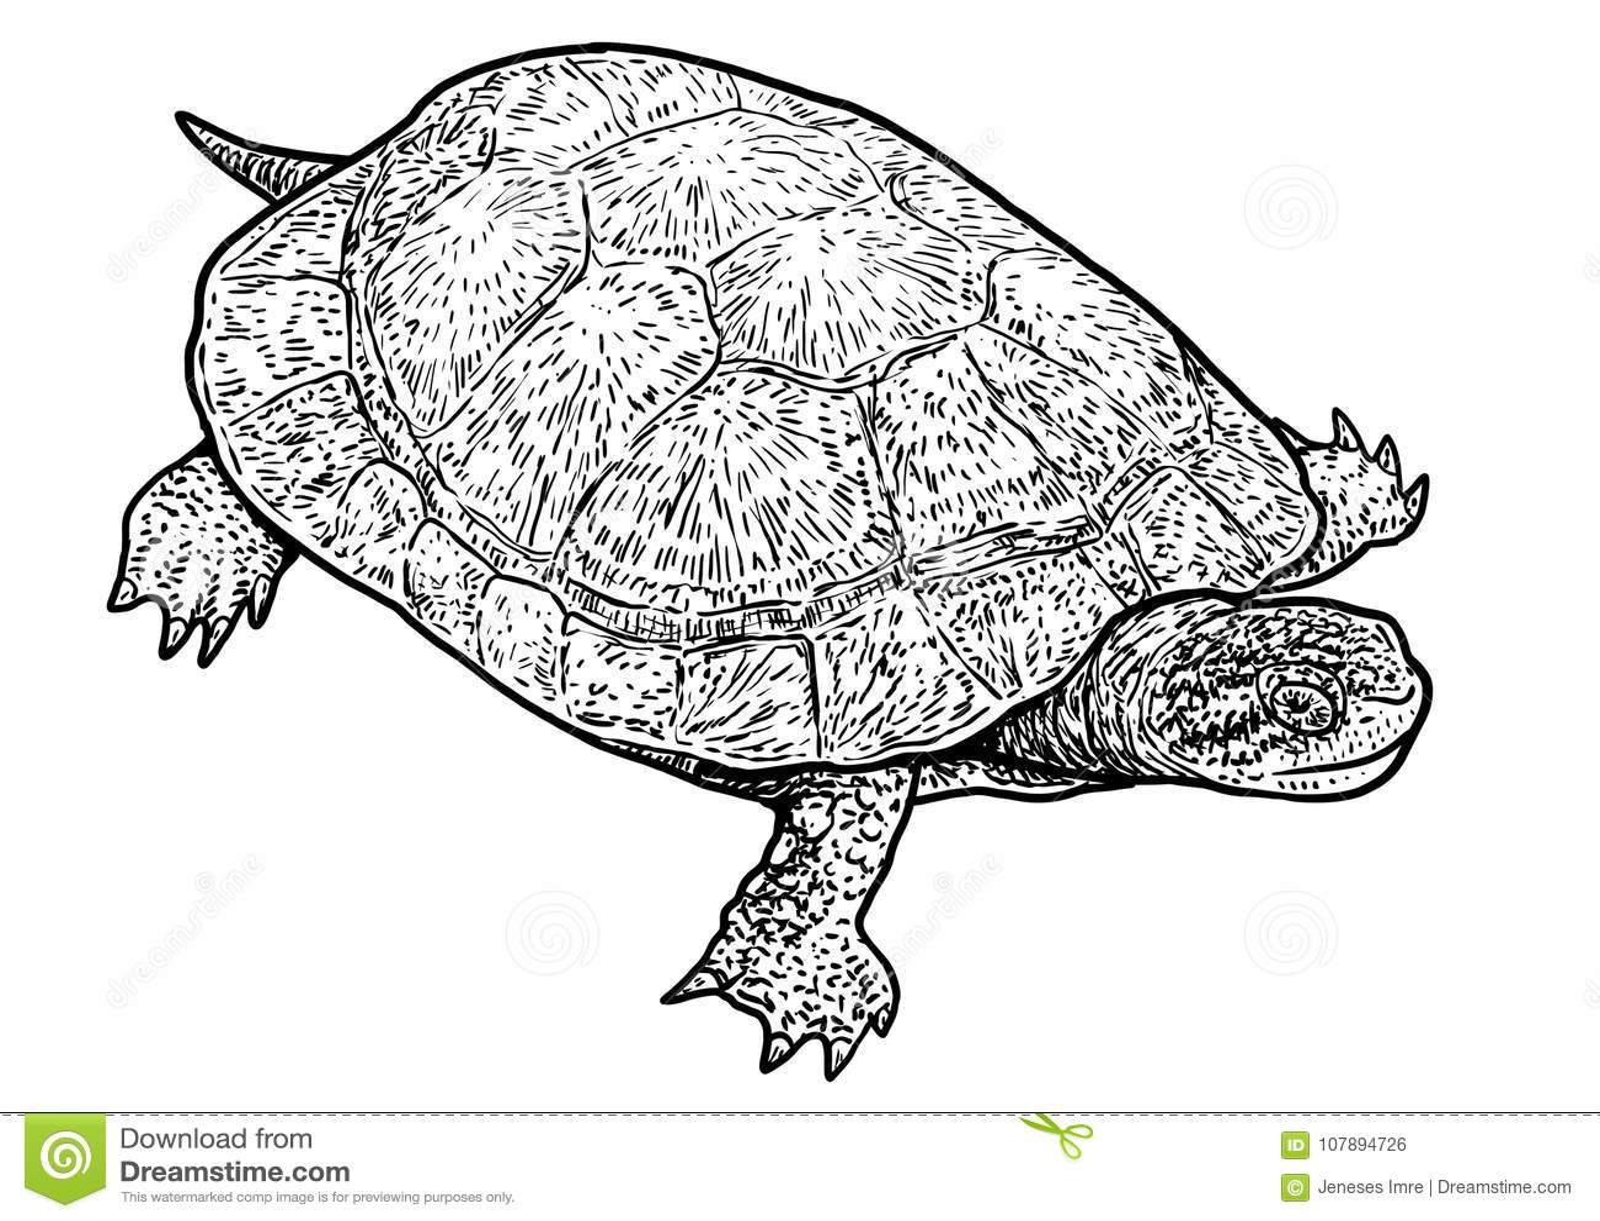 European Pond Turtle Illustration Drawing Engraving Ink